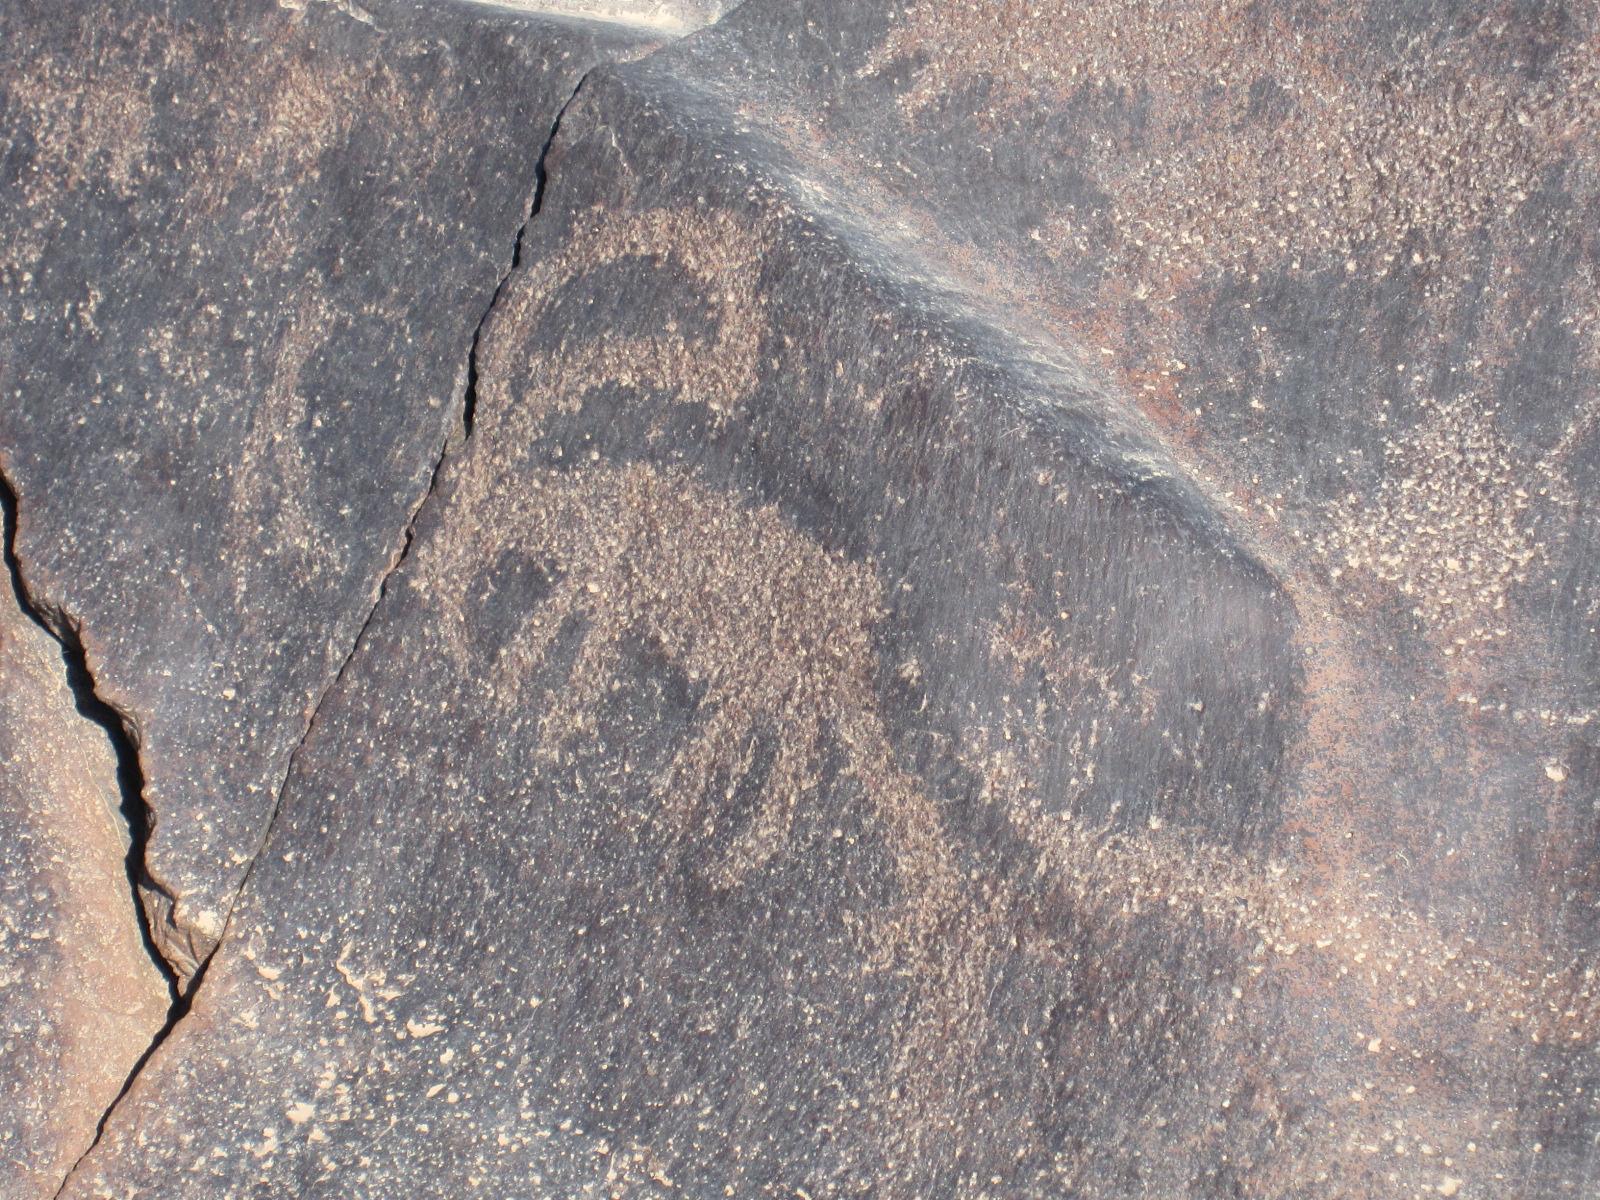 Petroglyph_Ibex_wisad_IMG_3047 2011